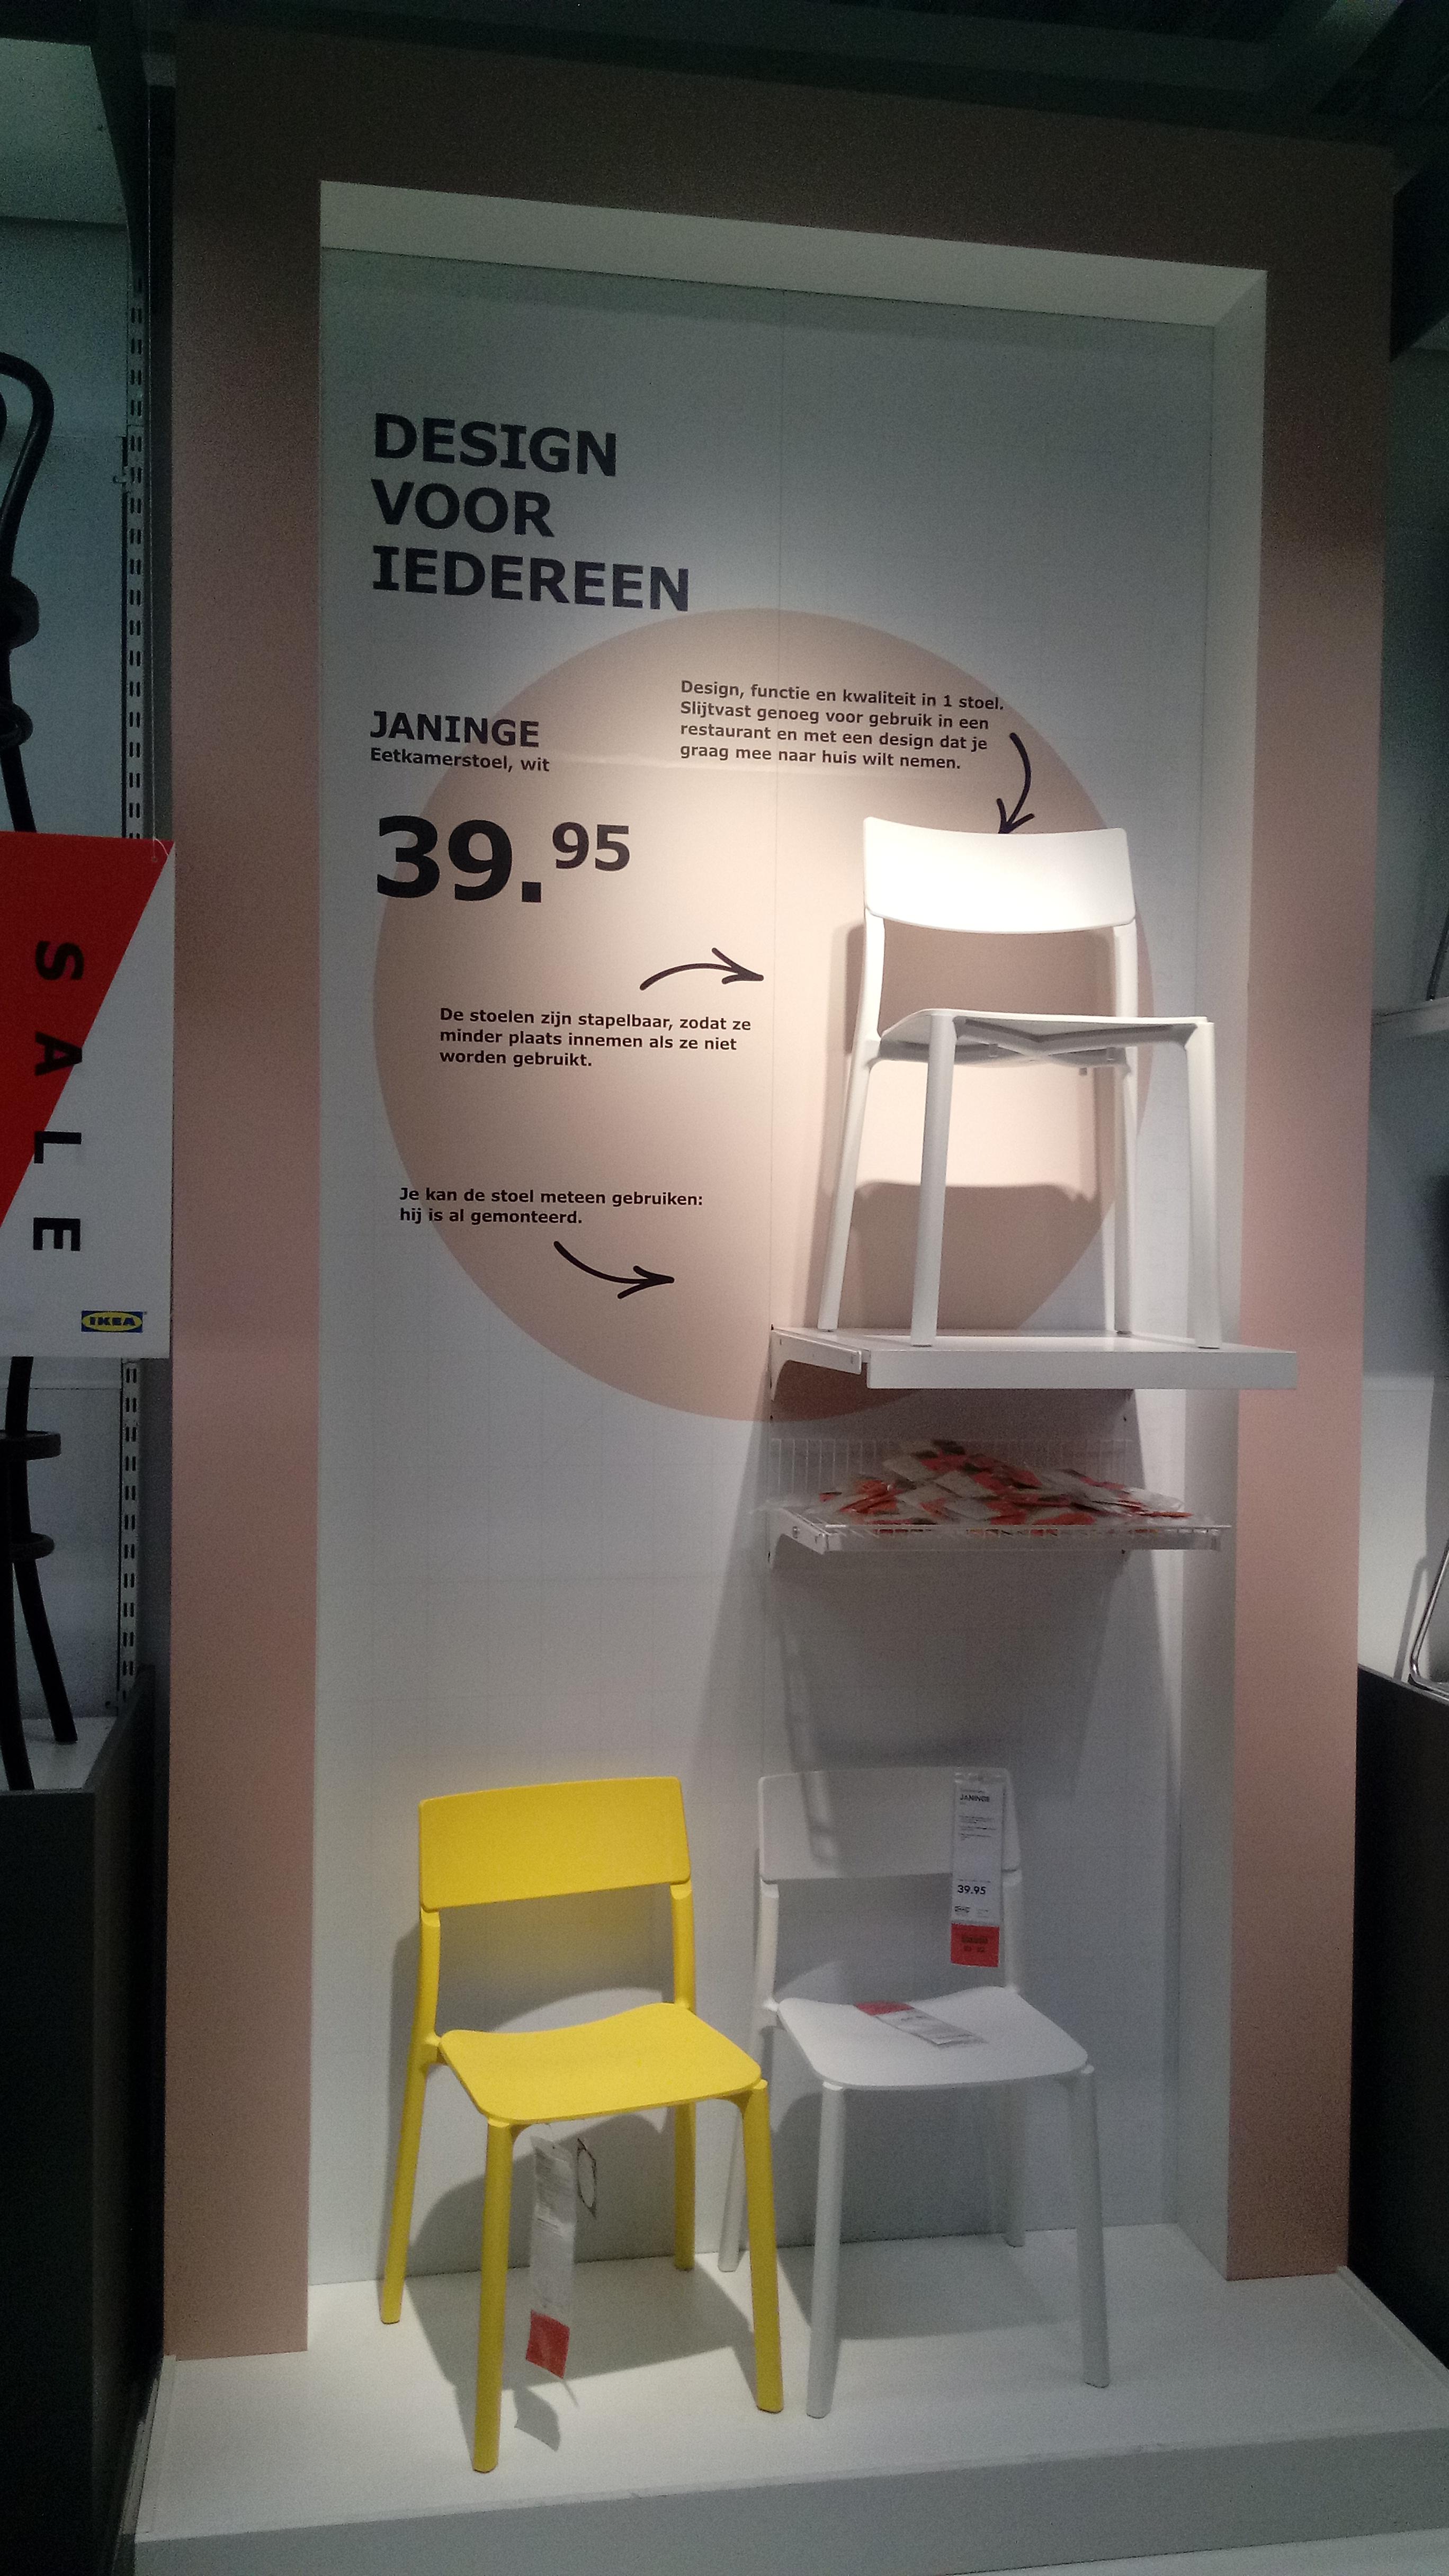 Eetkamer Stoel Ikea.File Interior Of Ikea Groningen 2018 04 Jpg Wikimedia Commons